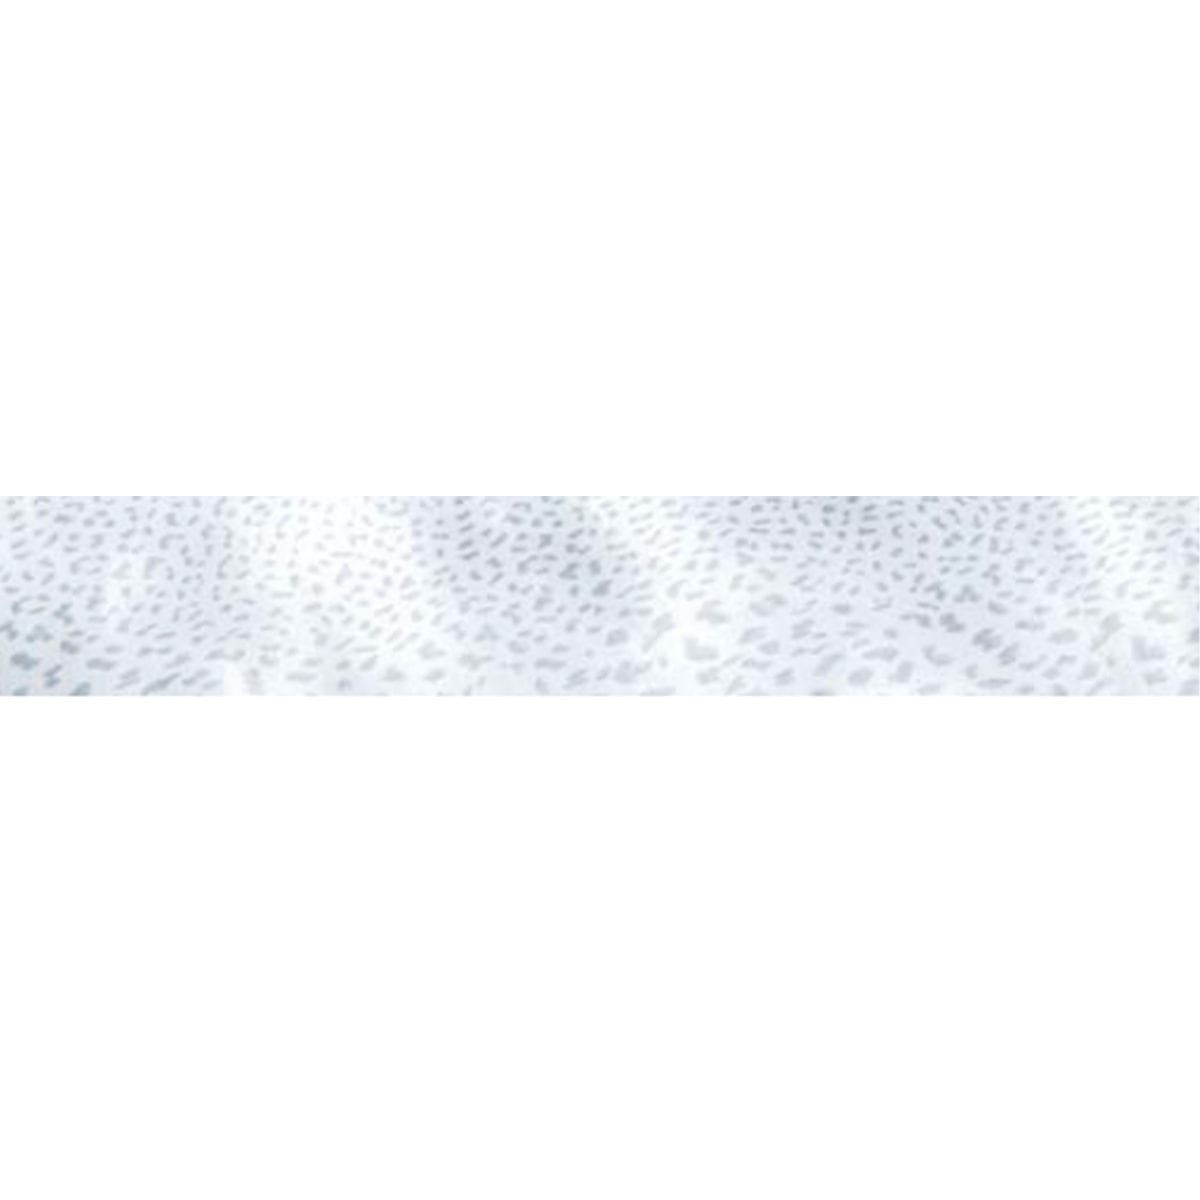 D00137 GIAGUARO MASK OCEAN BLUE P1